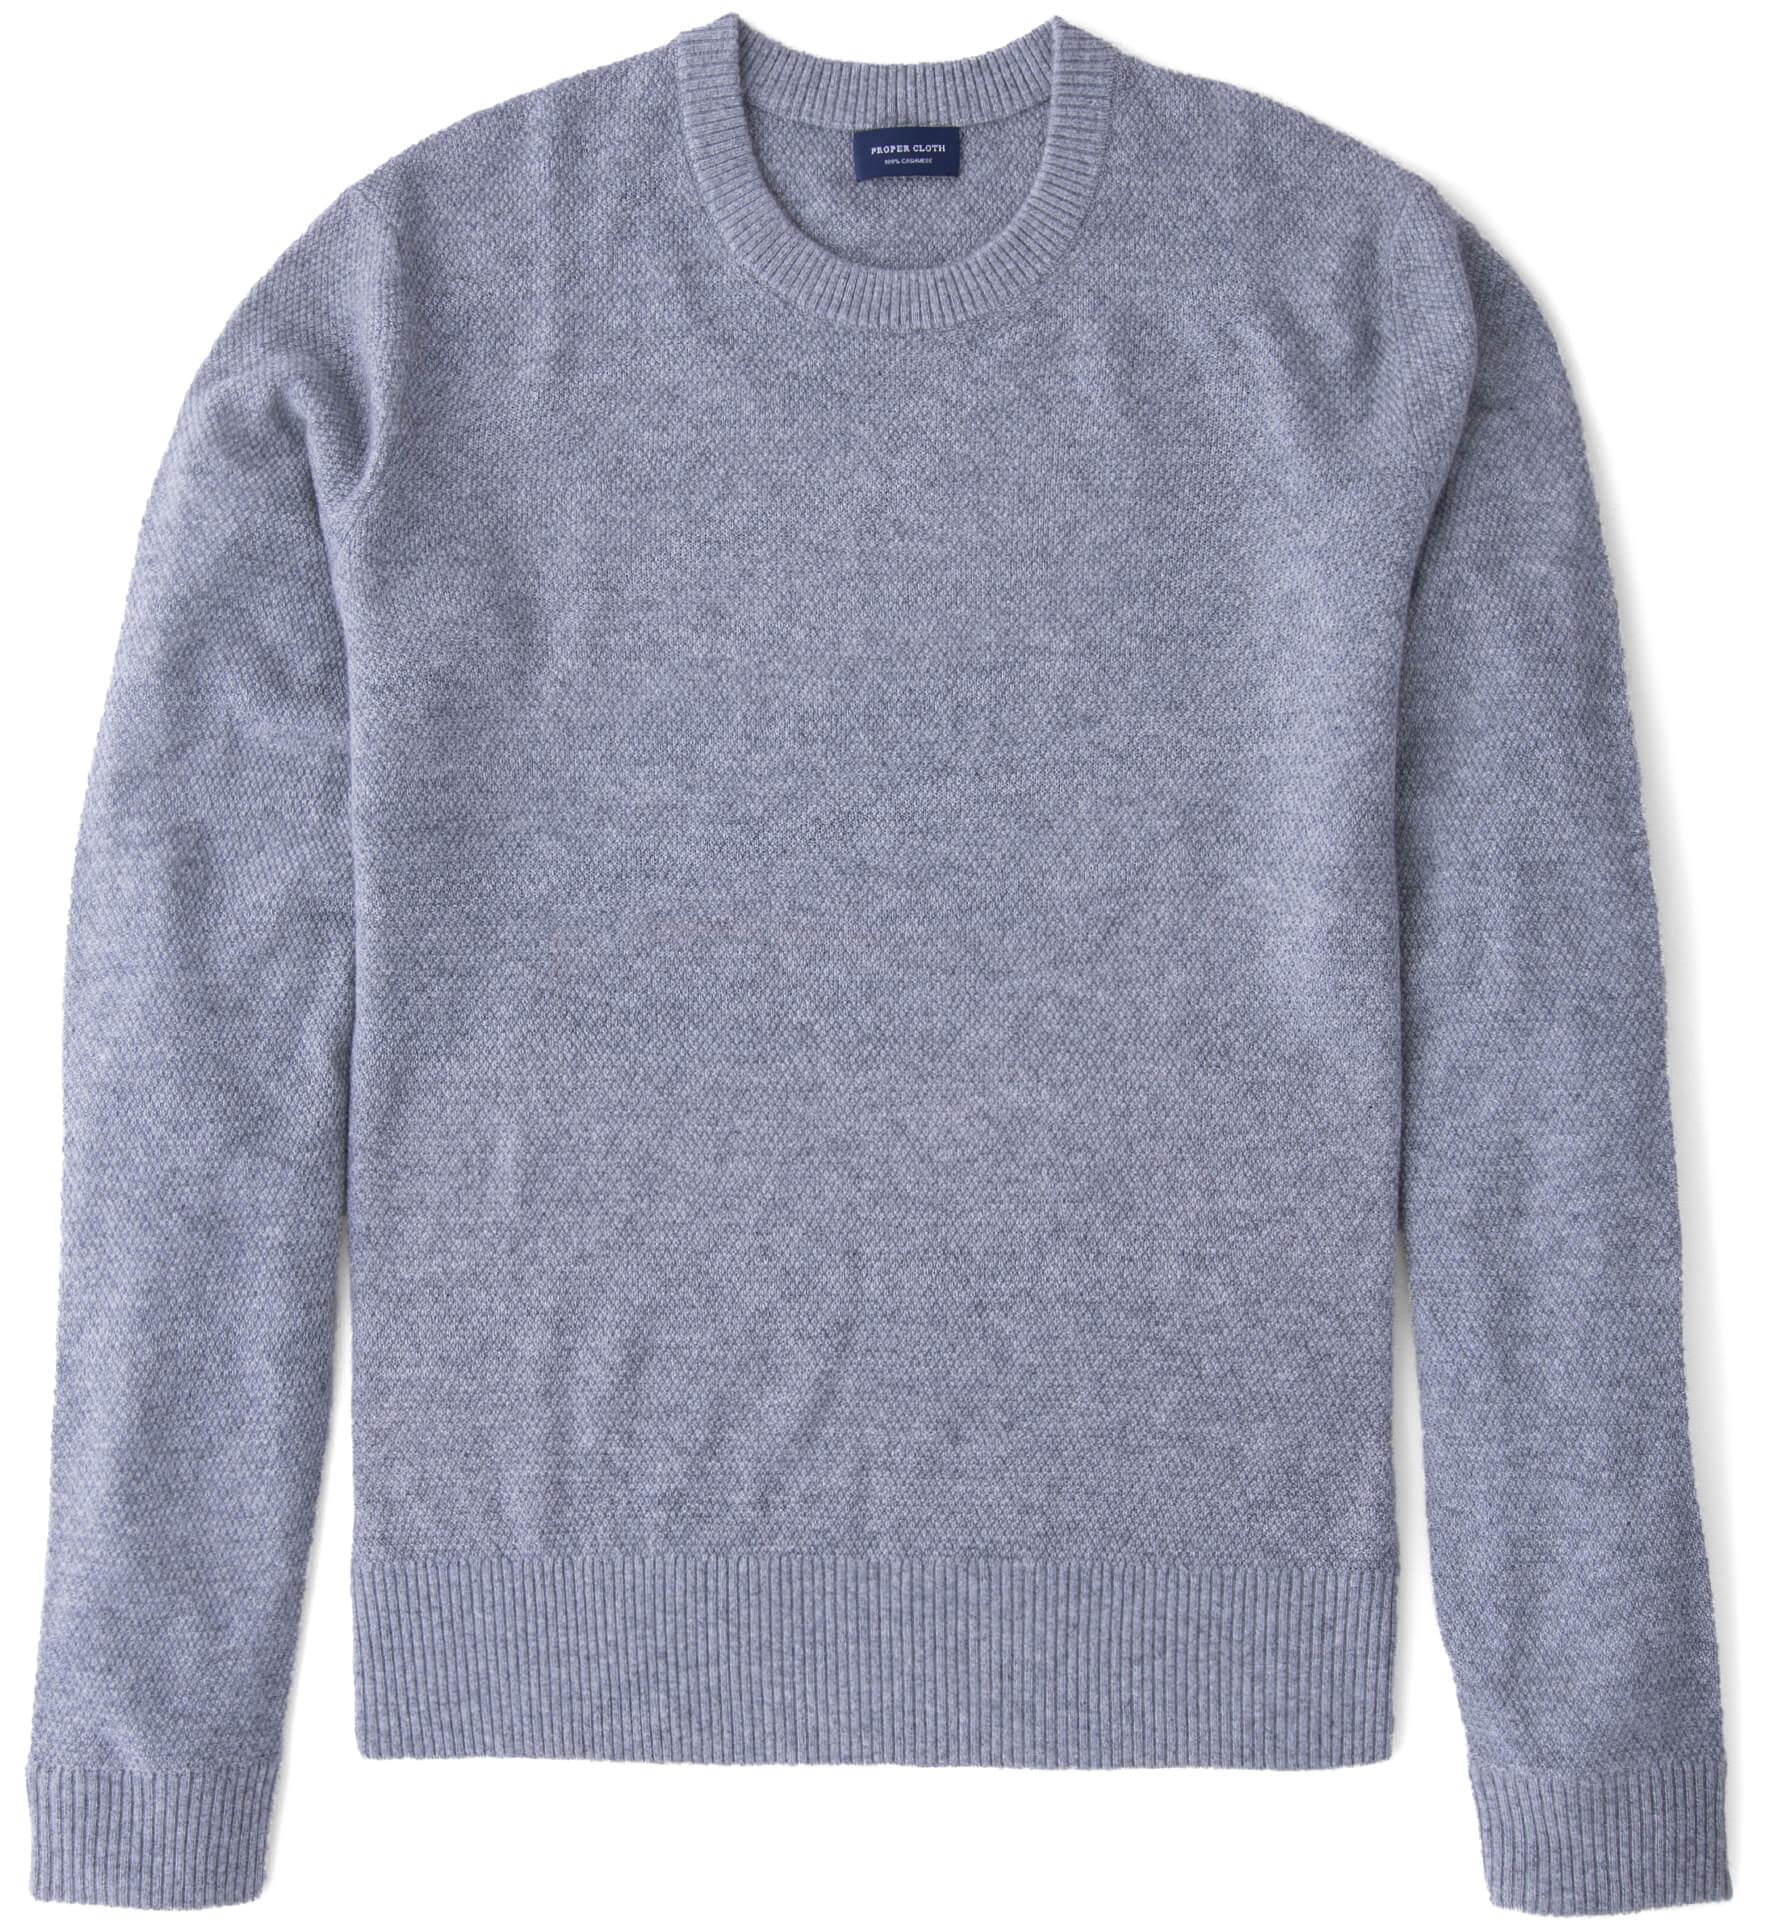 Zoom Image of Light Grey Cobble Stitch Cashmere Crewneck Sweater